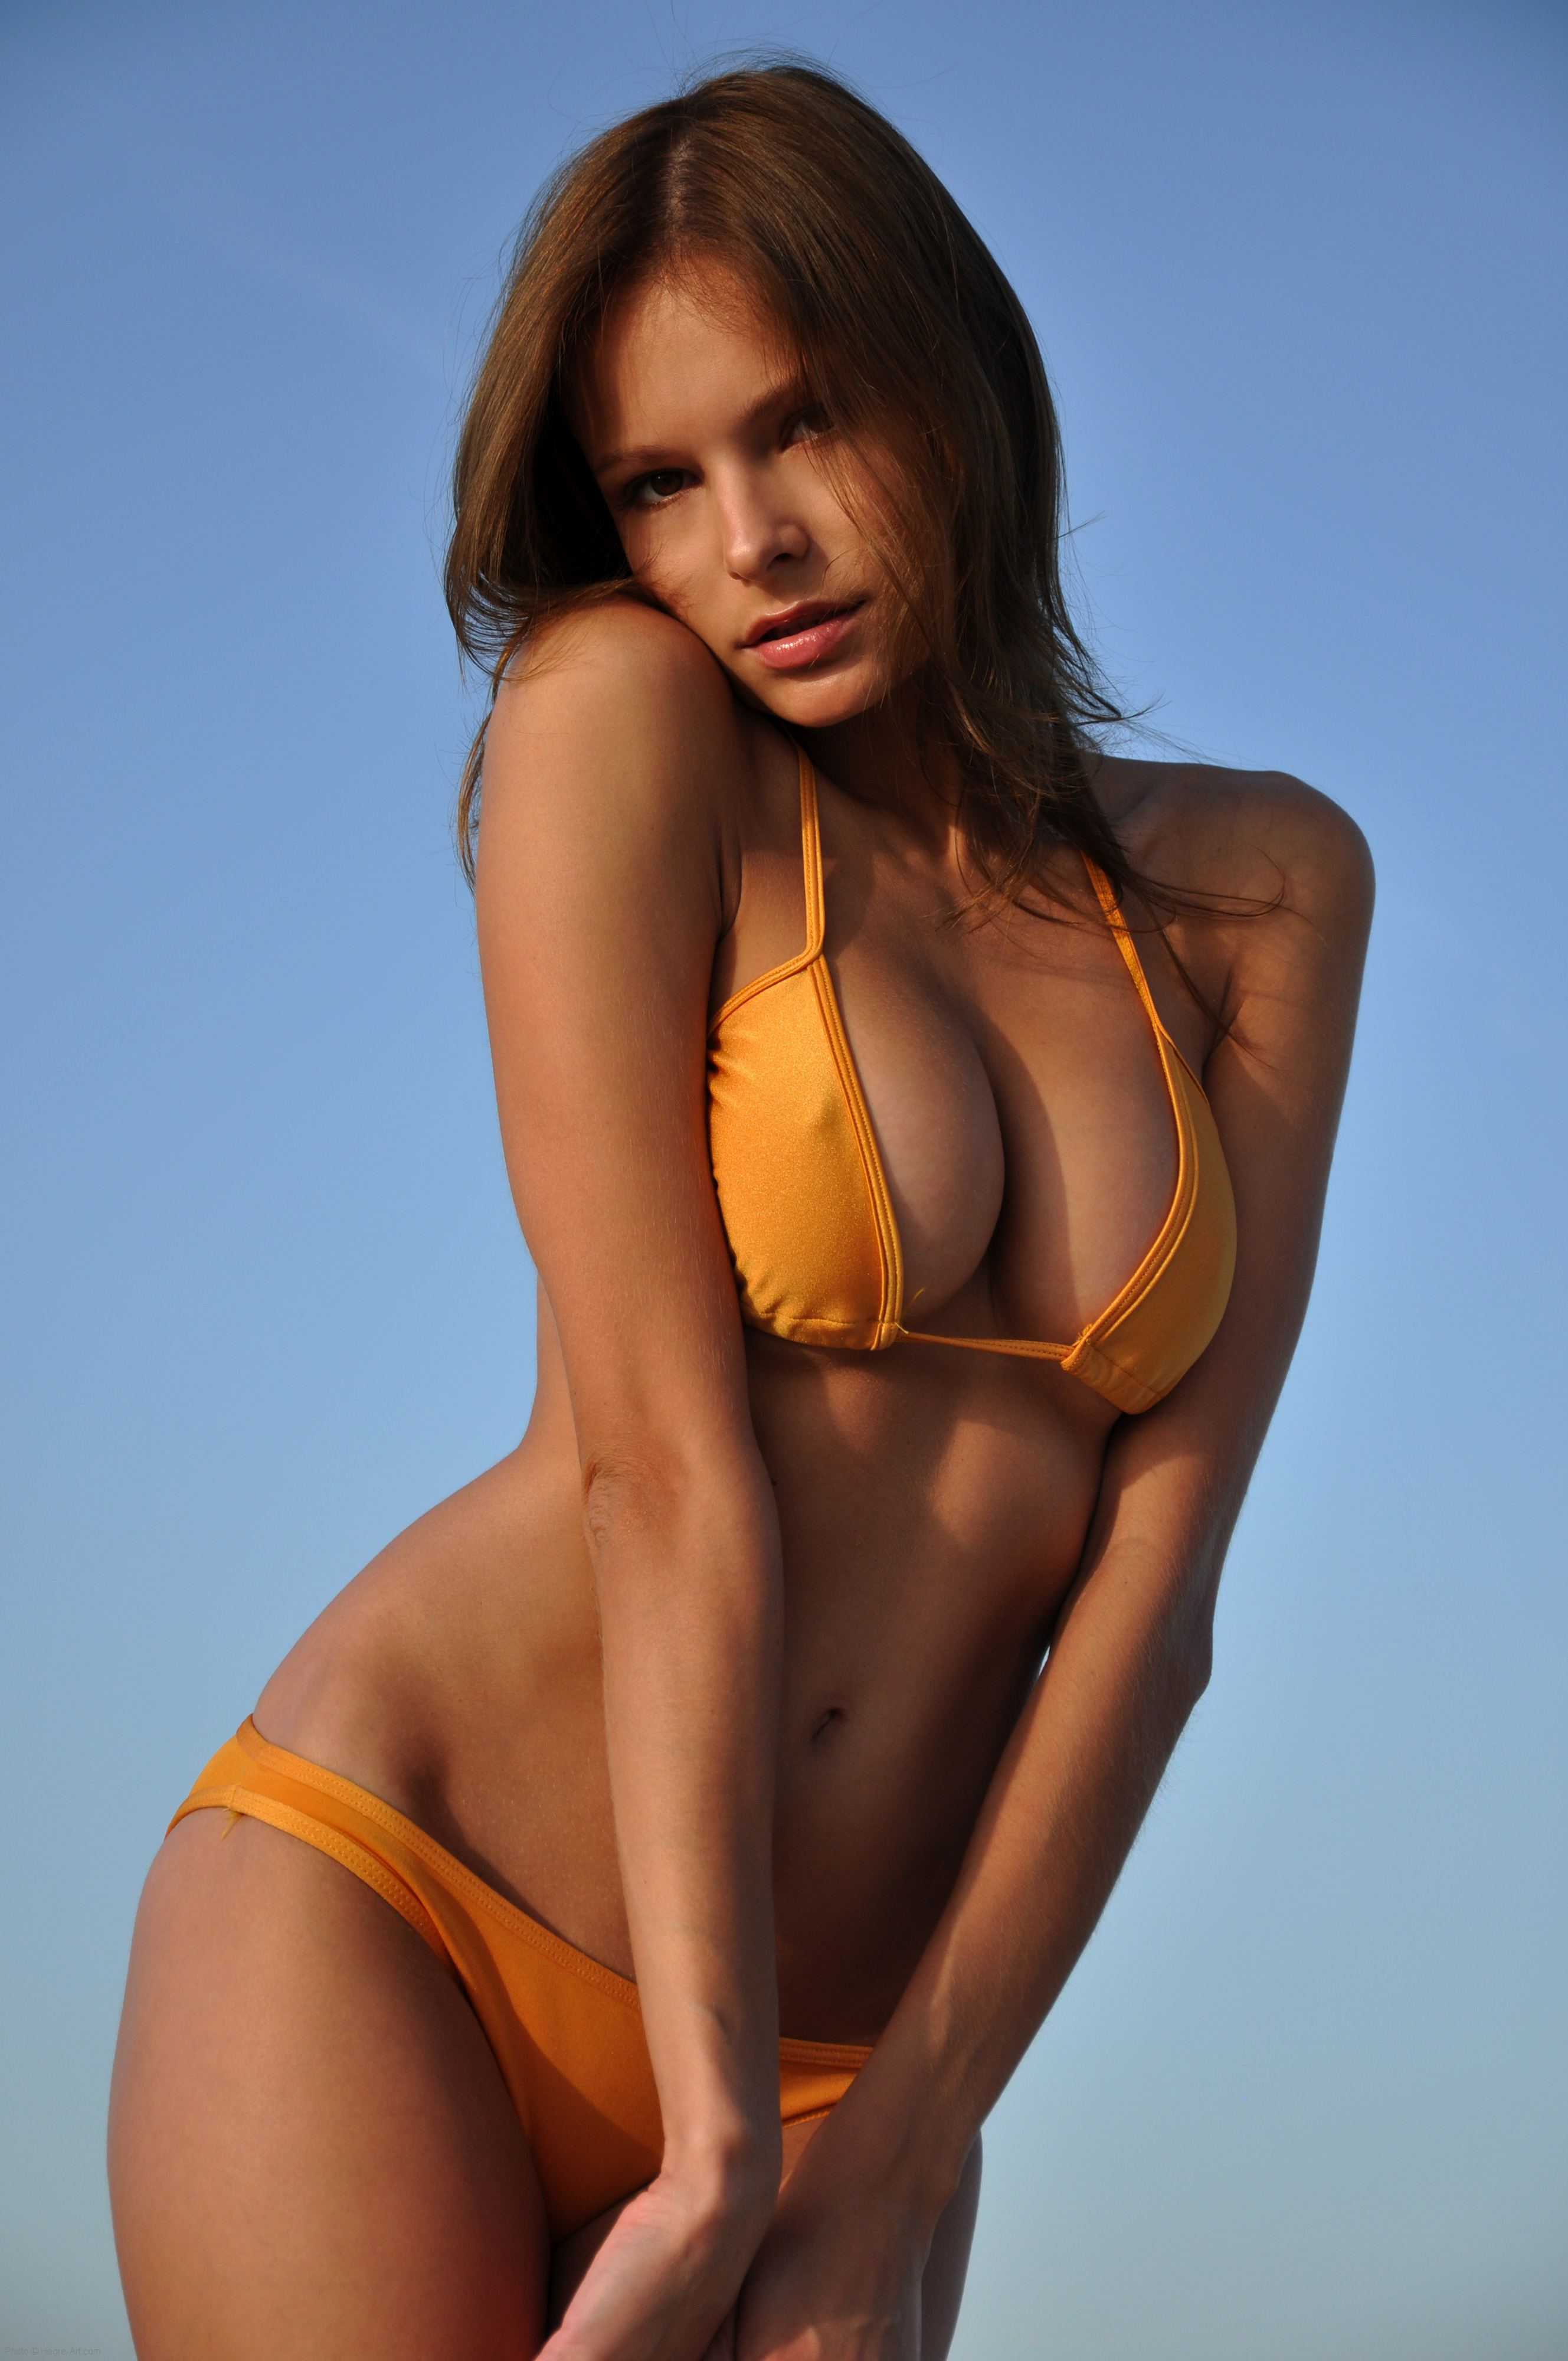 Luba Bikini Sitges 102009 013 xxl